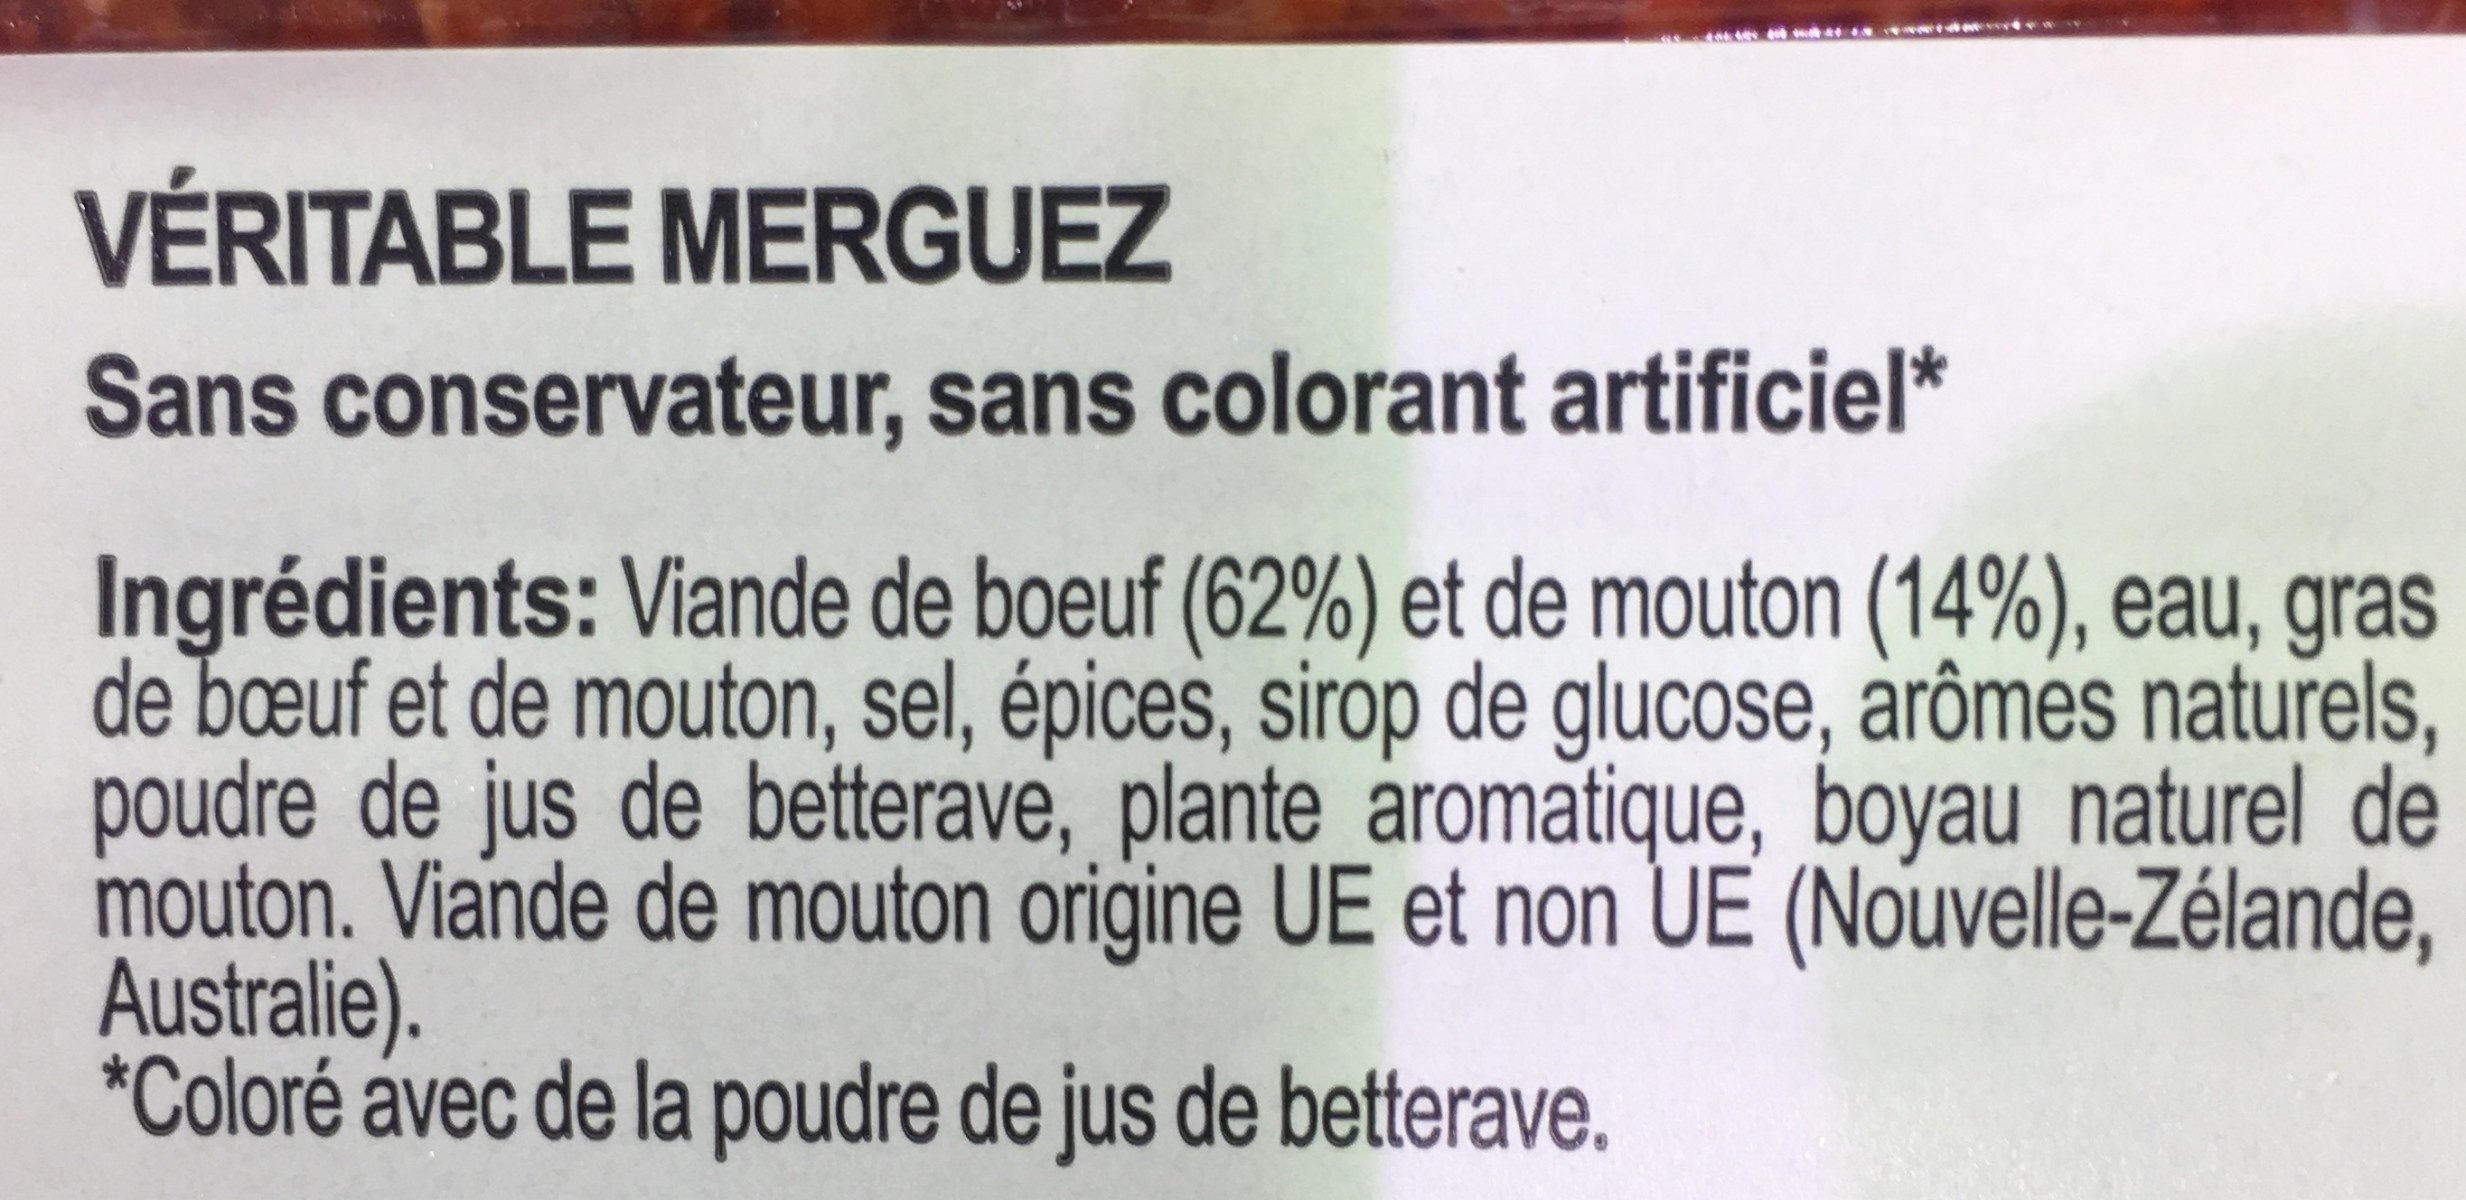 Véritable Merguez Boeuf & Mouton (x 12) - Ingrediënten - fr